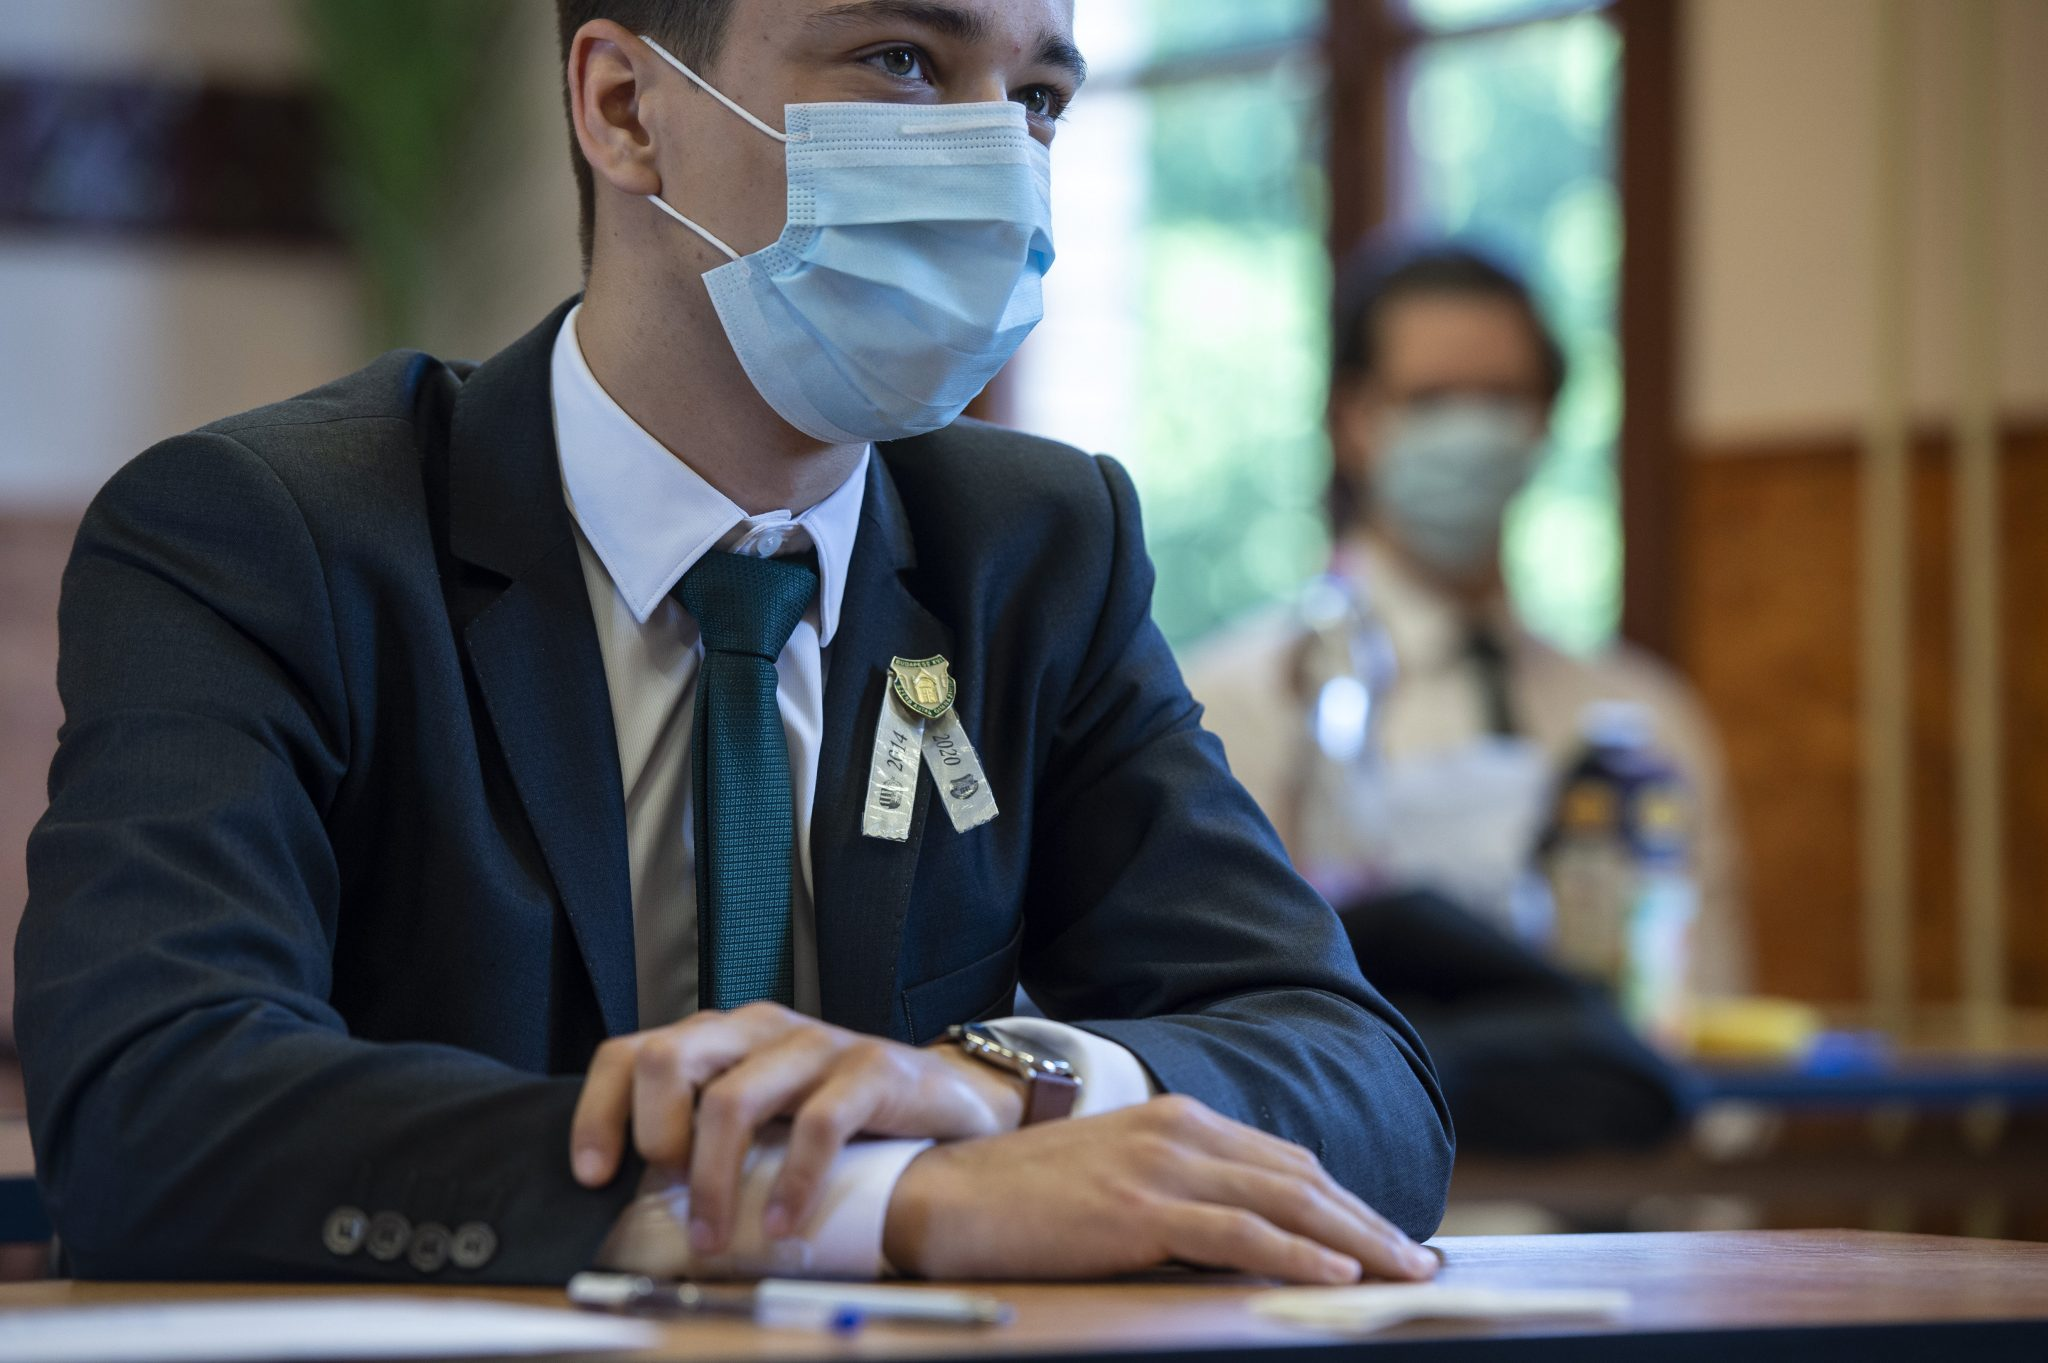 Coronavirus: Final Exams Started Under Irregular Circumstances in Hungarian Secondary Schools